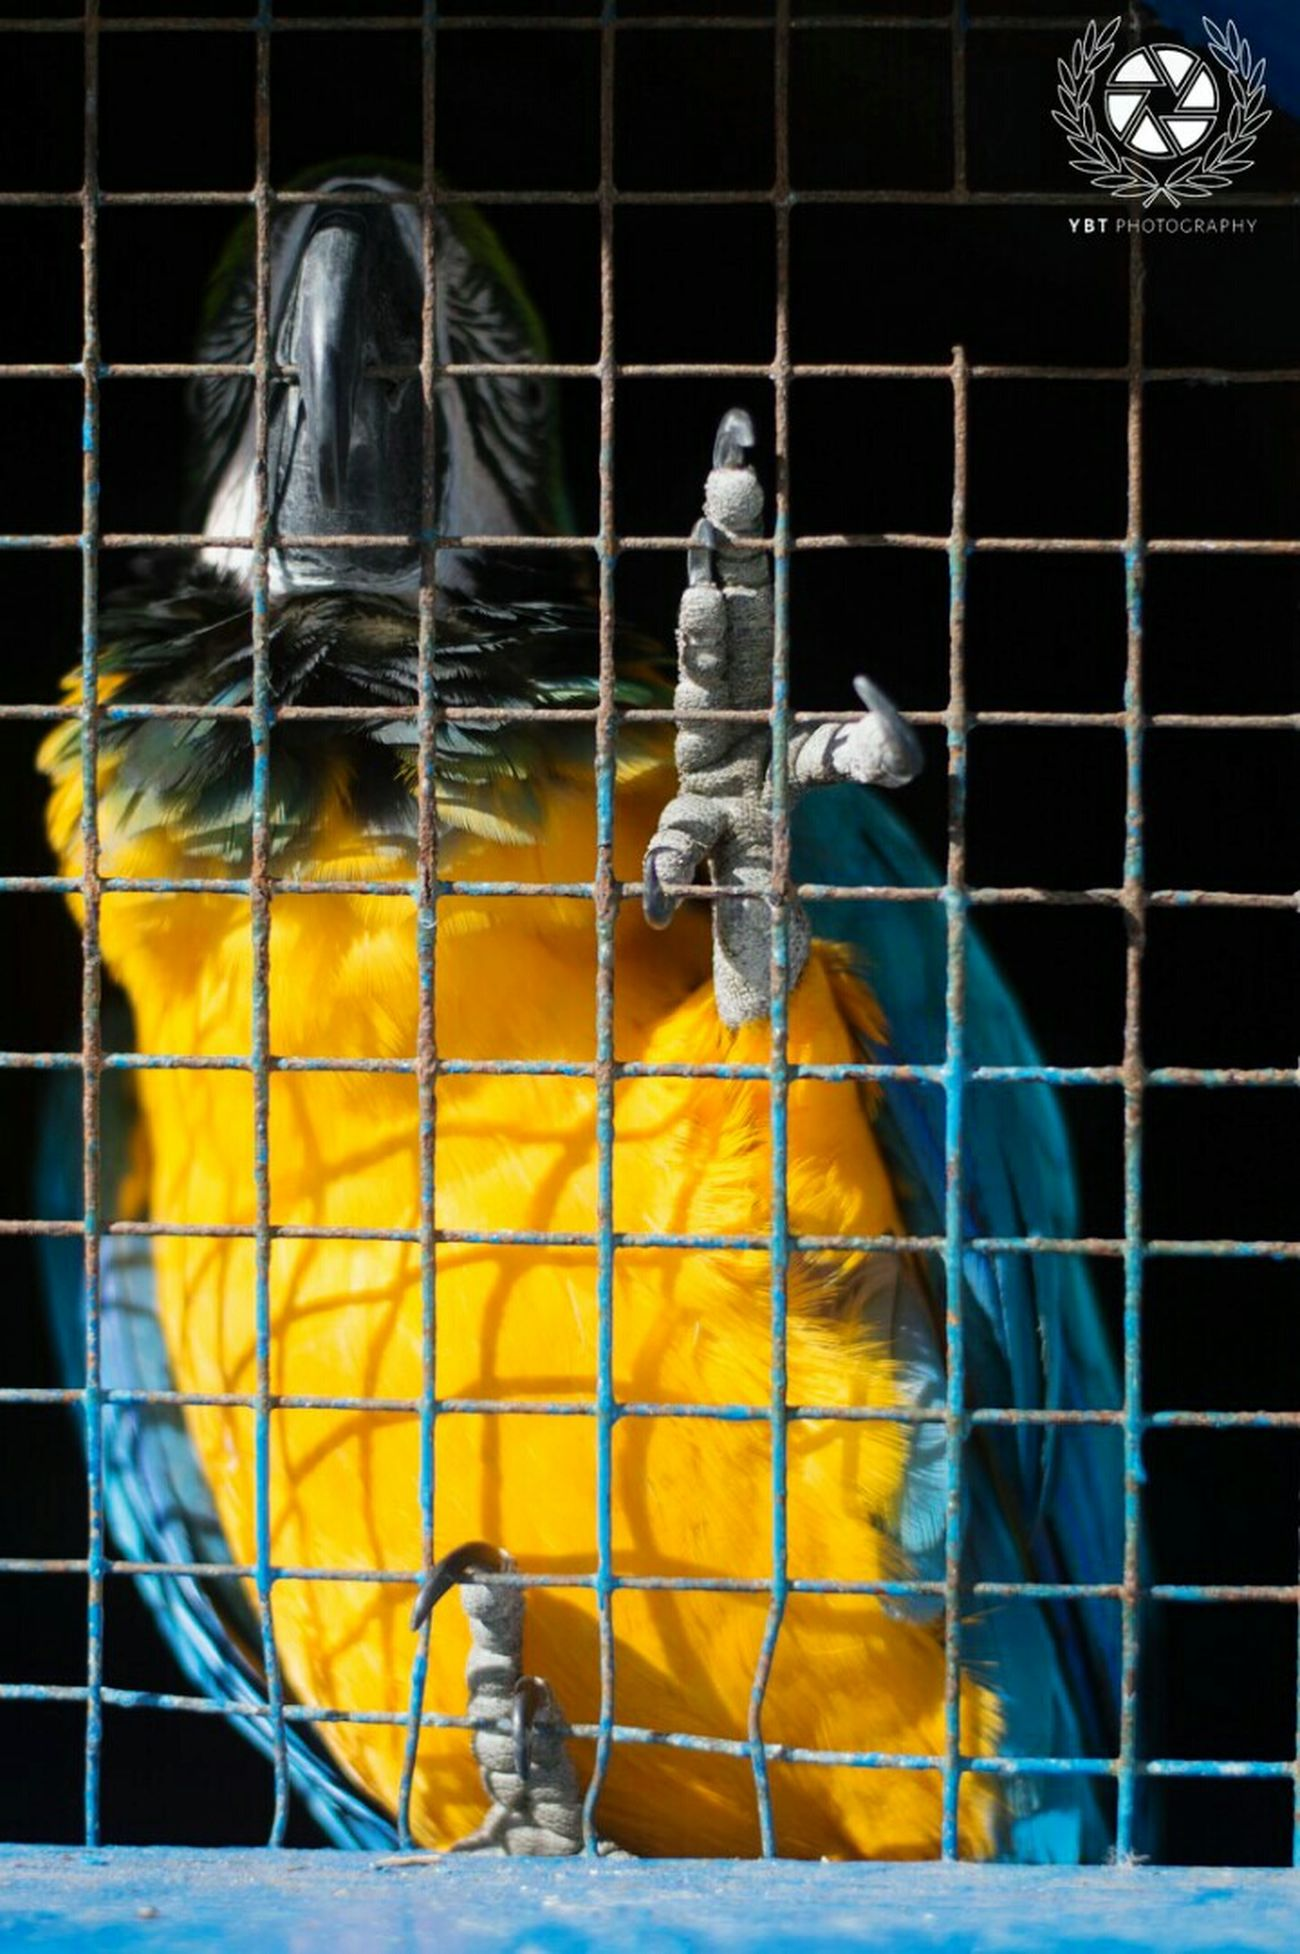 Parrot Bird Photography Birdwatching Looking For Freedom Awesome EyeEm Best Shots Eyemtunisia Nikonphotography